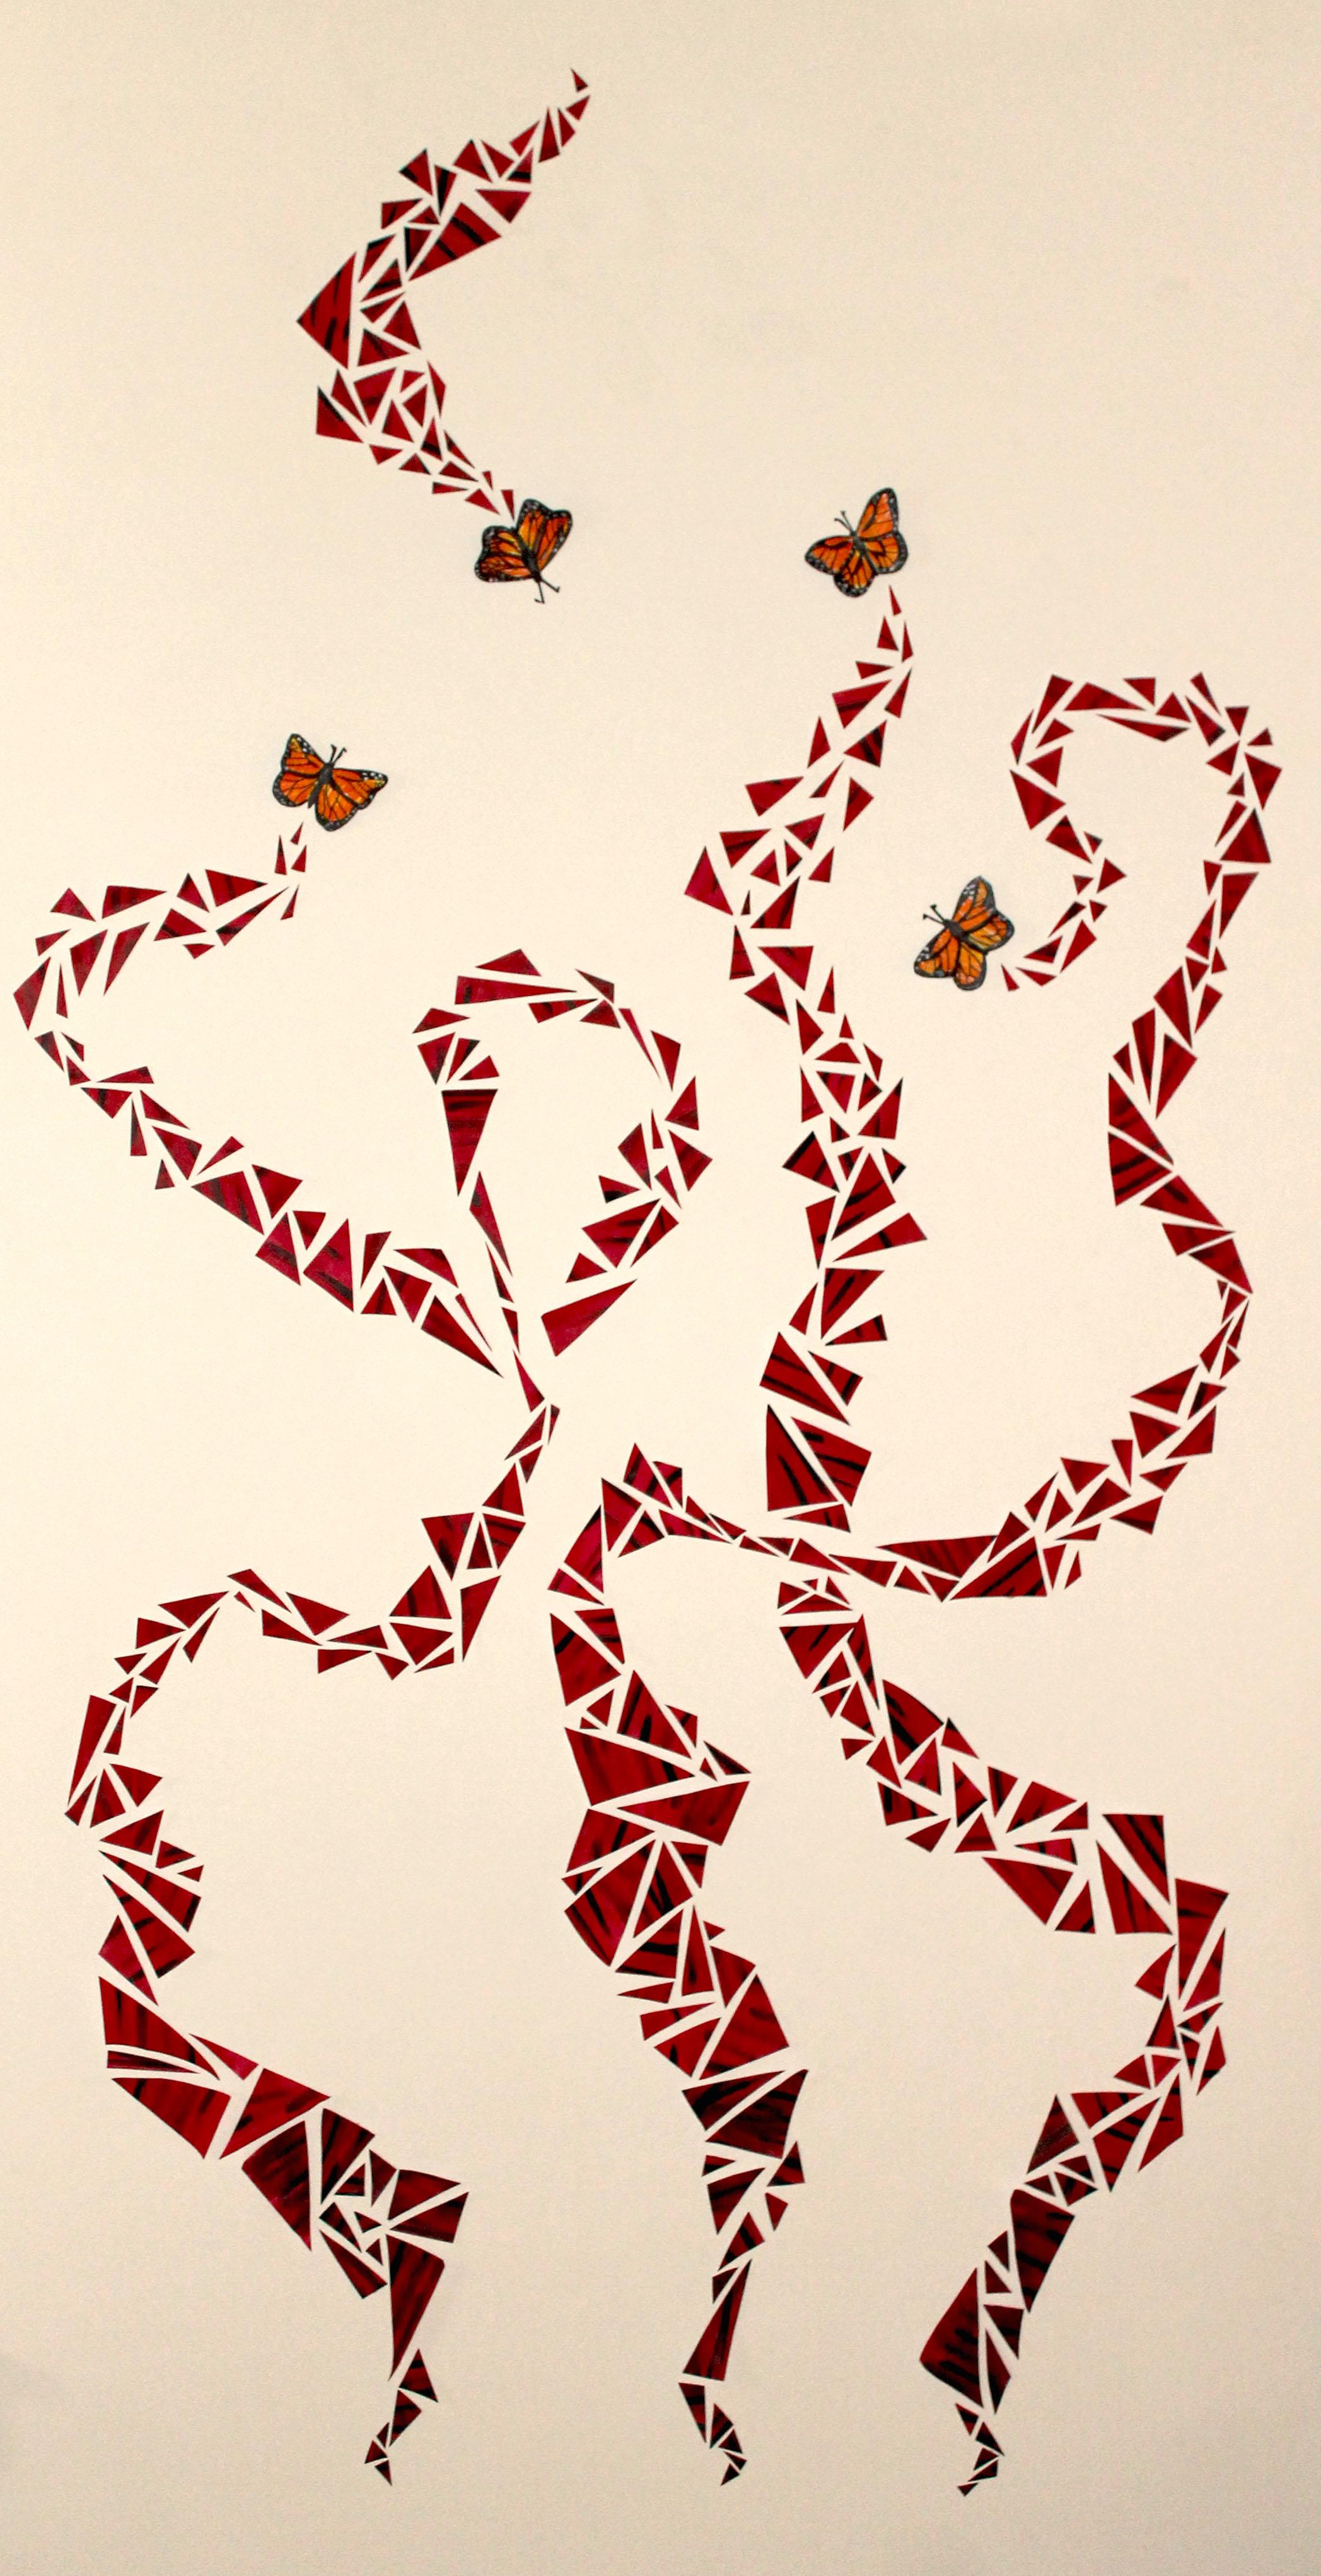 Flight, 2015, paper, acrylic, marker, 6.5ft x 4ft